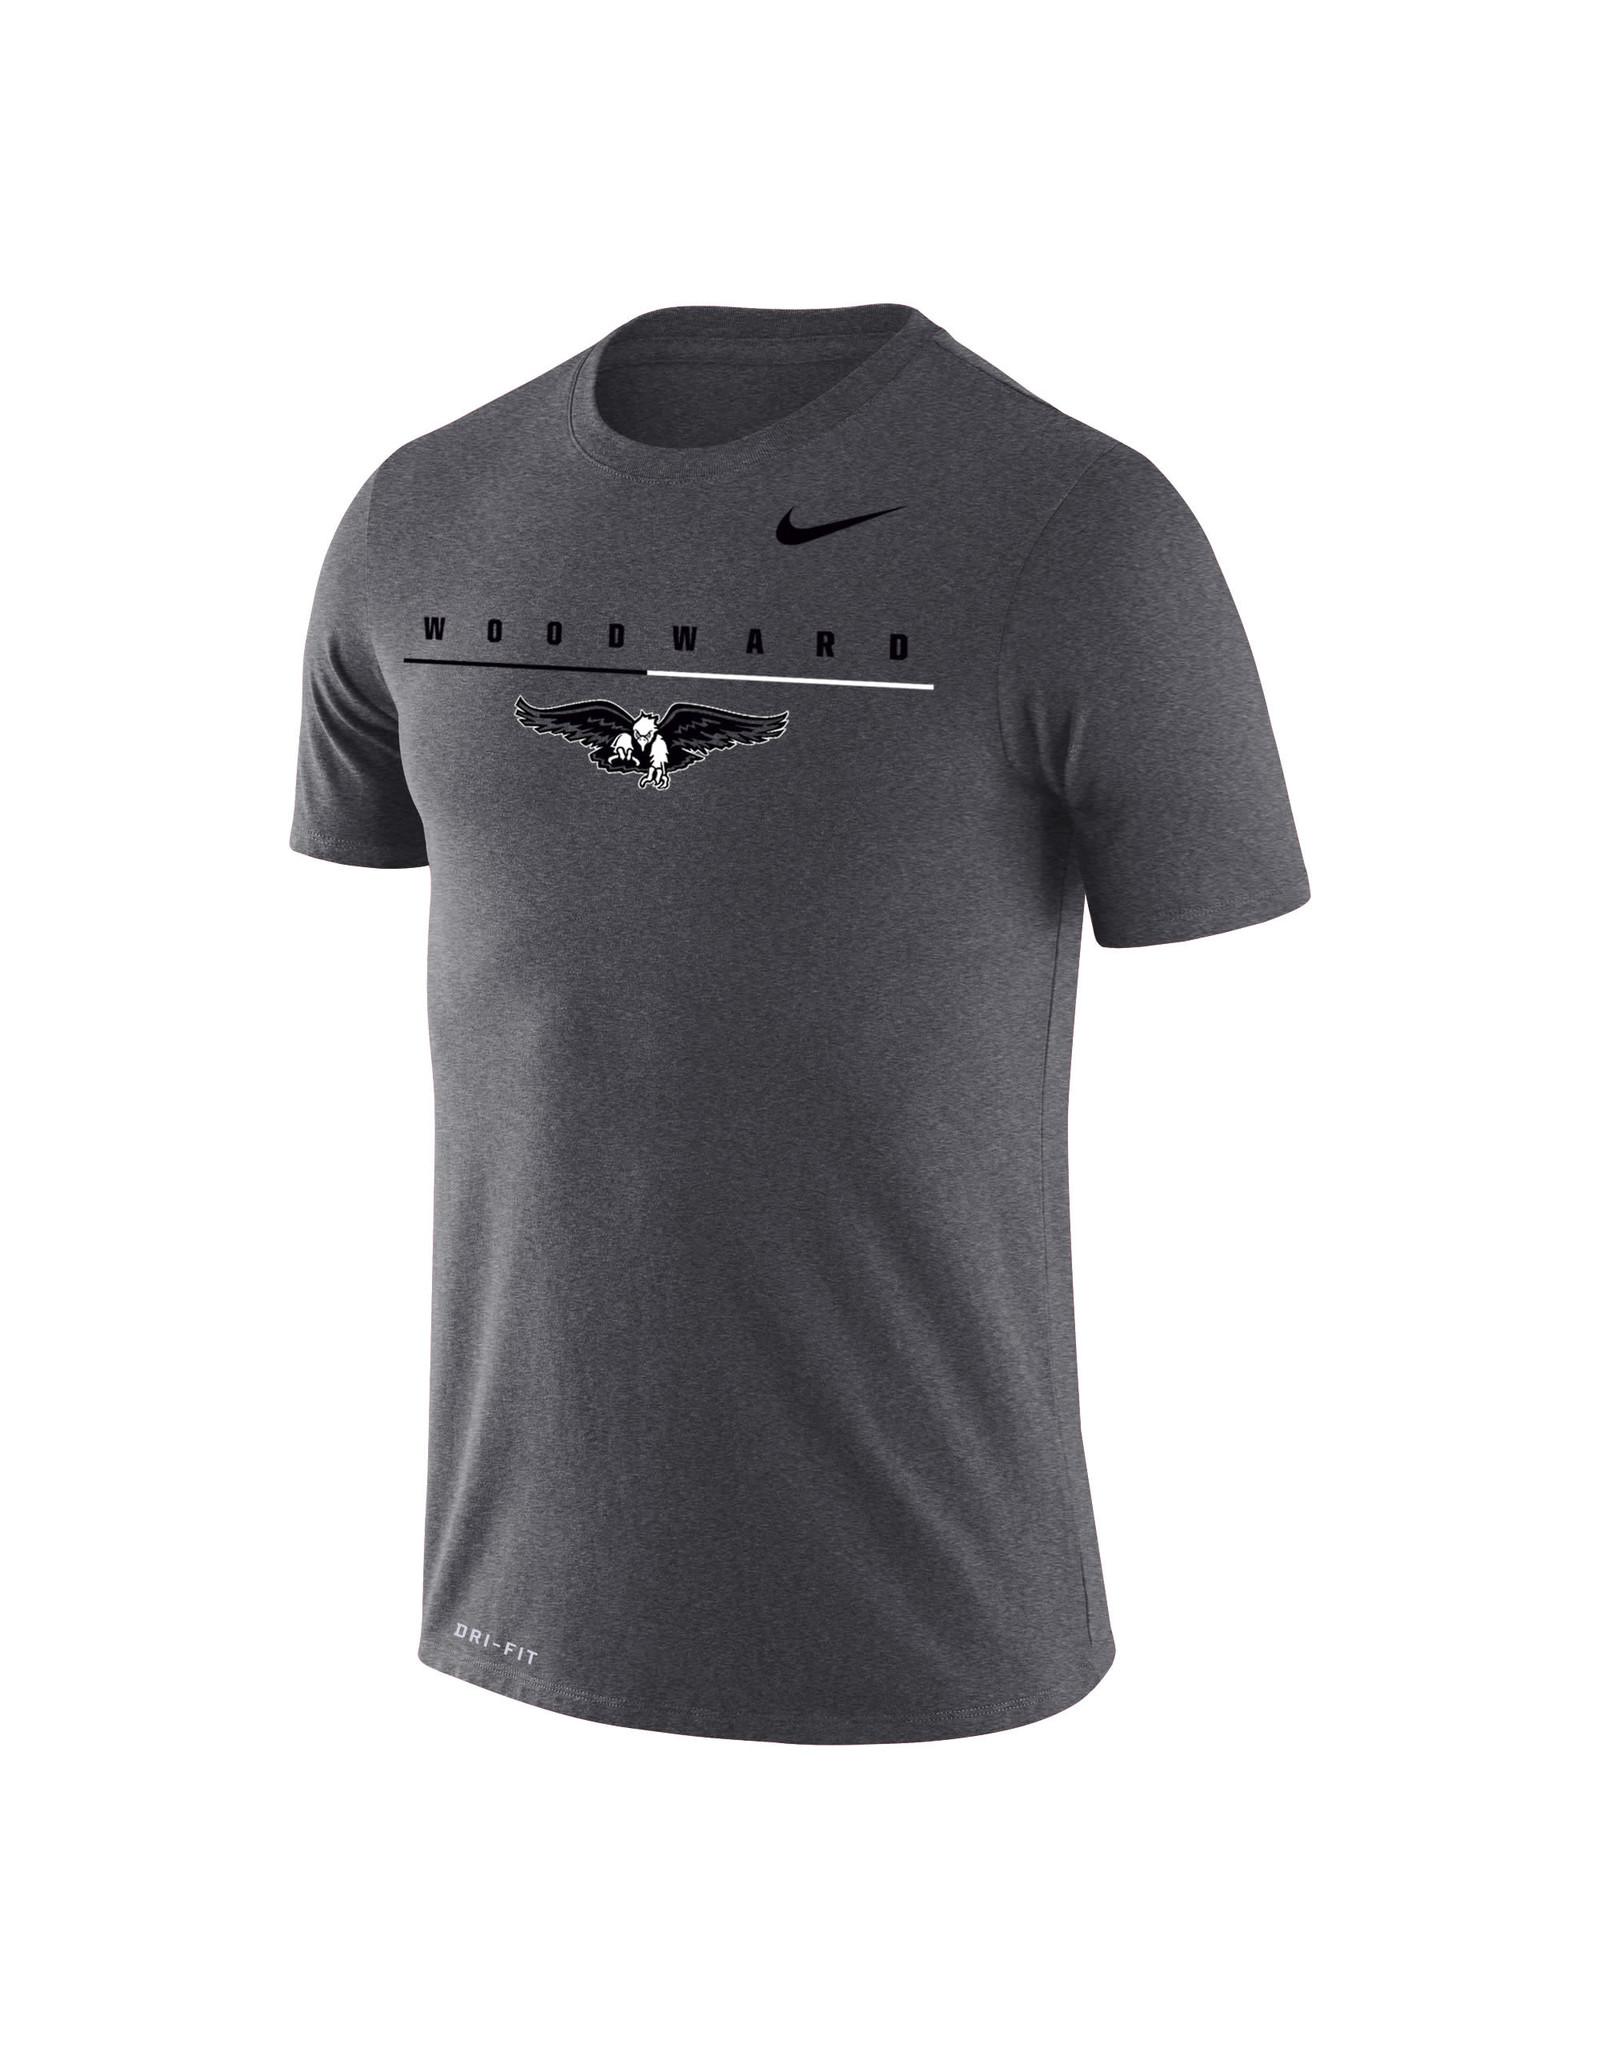 NIKE Legend Dri-Fit SS T Shirt in Charcoal Heather